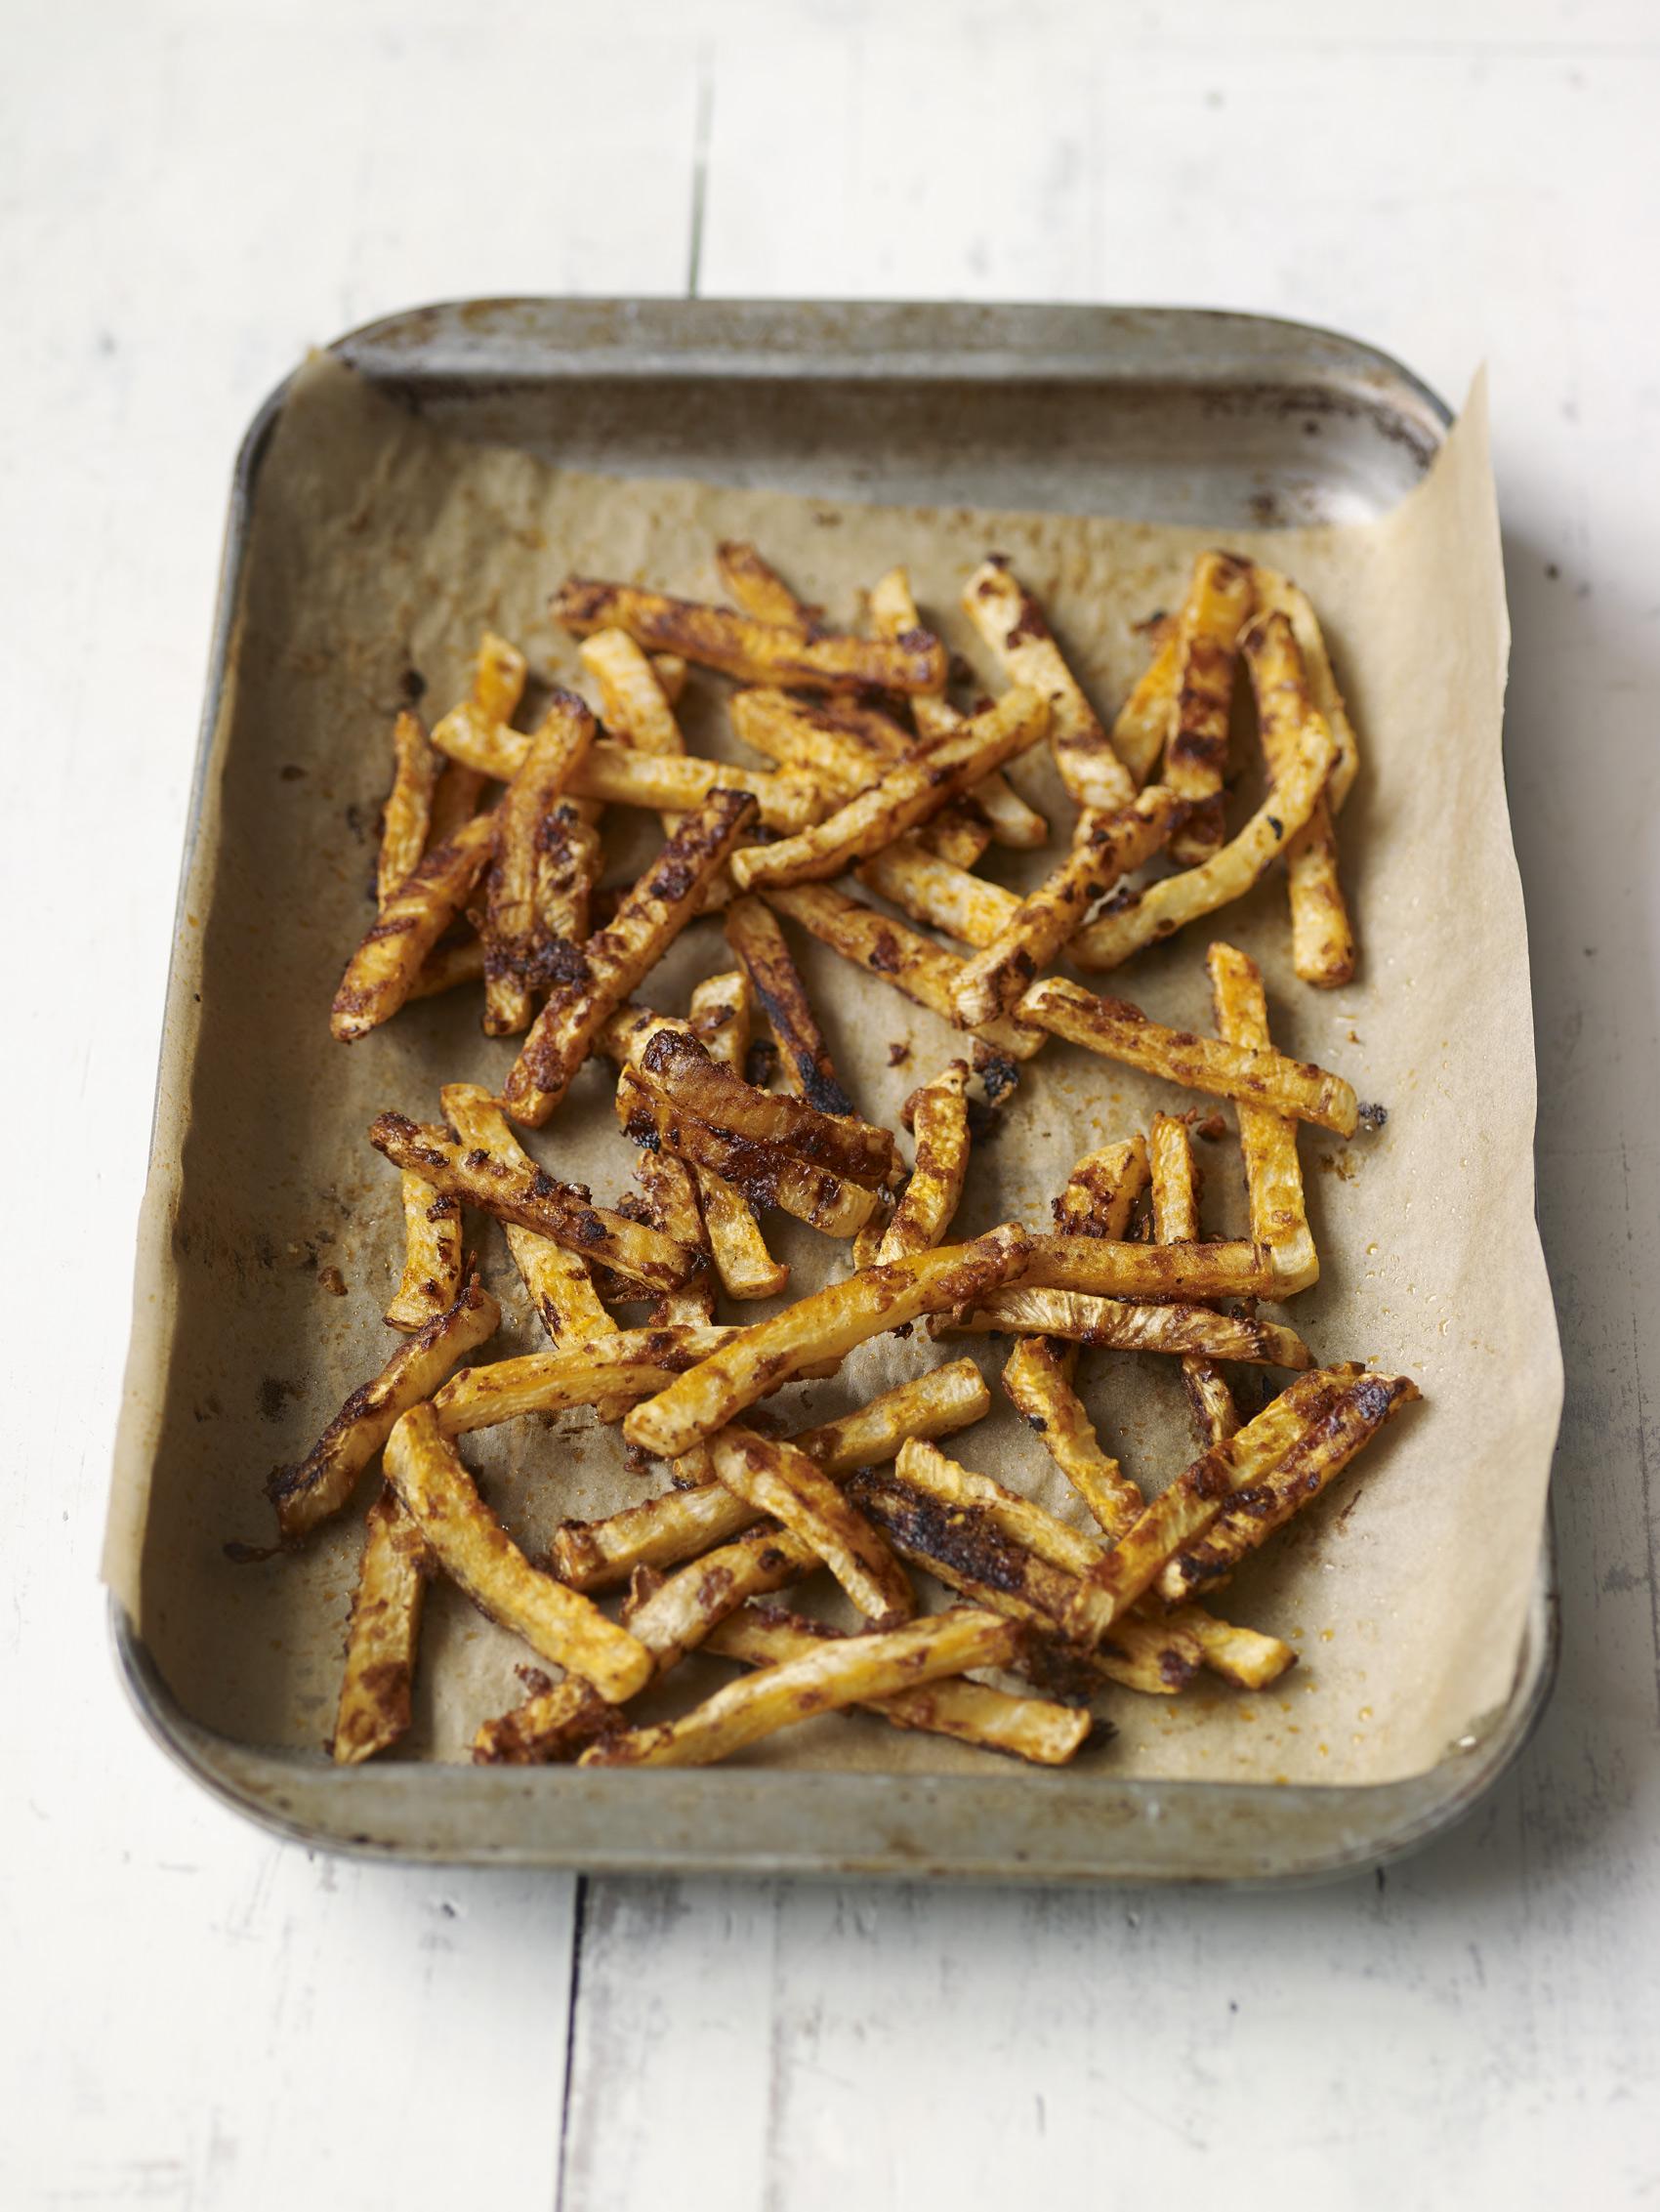 886_Ch10_Turnip_Fries.jpg